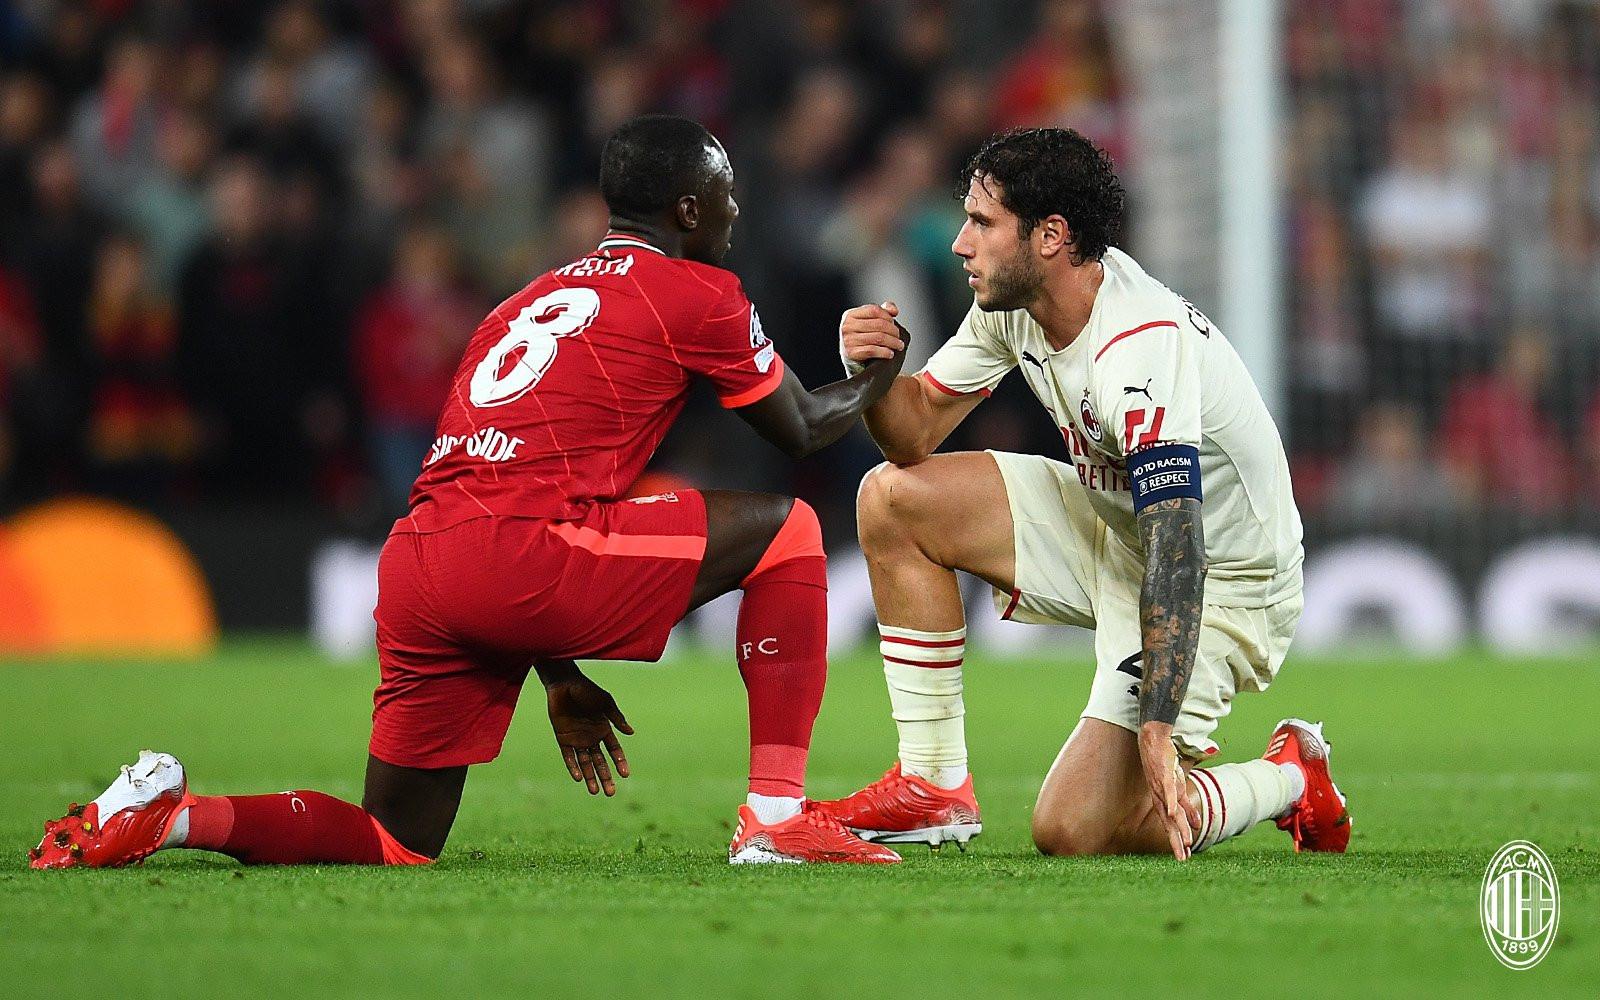 Cek Jadwal Liga Champions Pekan Ini: Ada Big Match Atletico vs Liverpool - JPNN.com